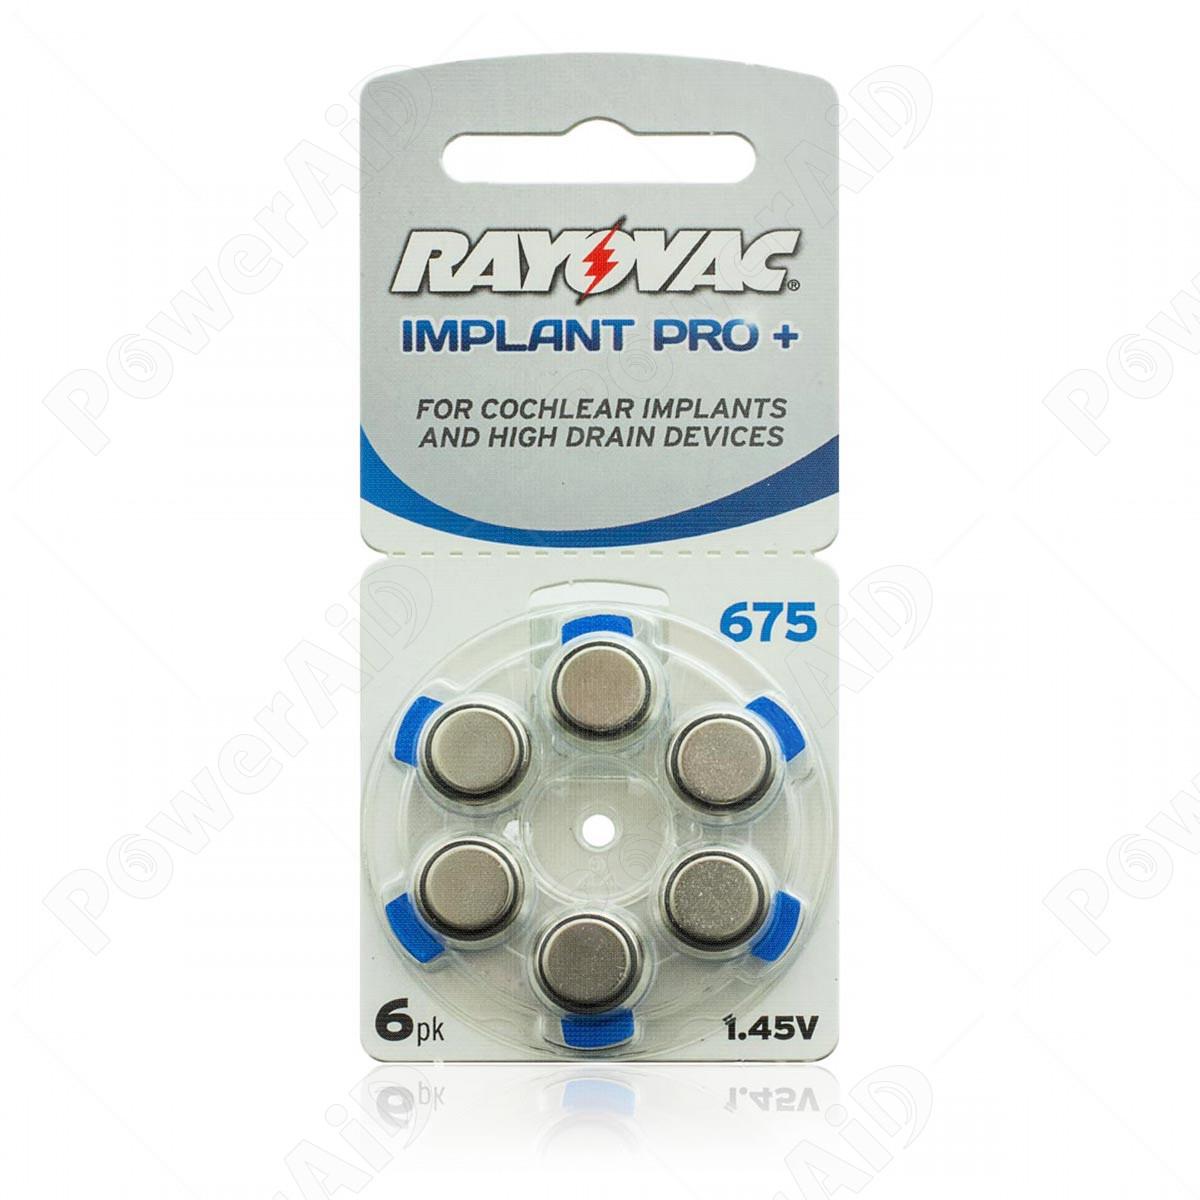 Rayovac - Blister 6 pile Implant Pro+